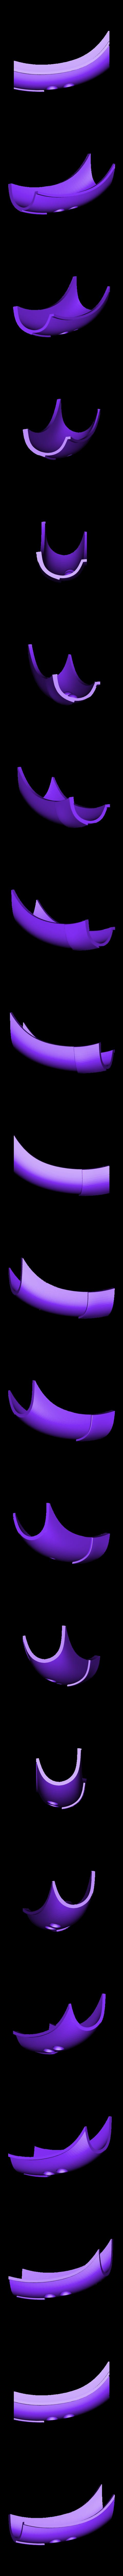 Part 23 v1.stl Download STL file ARF Trooper Helmet • 3D print object, VillainousPropShop